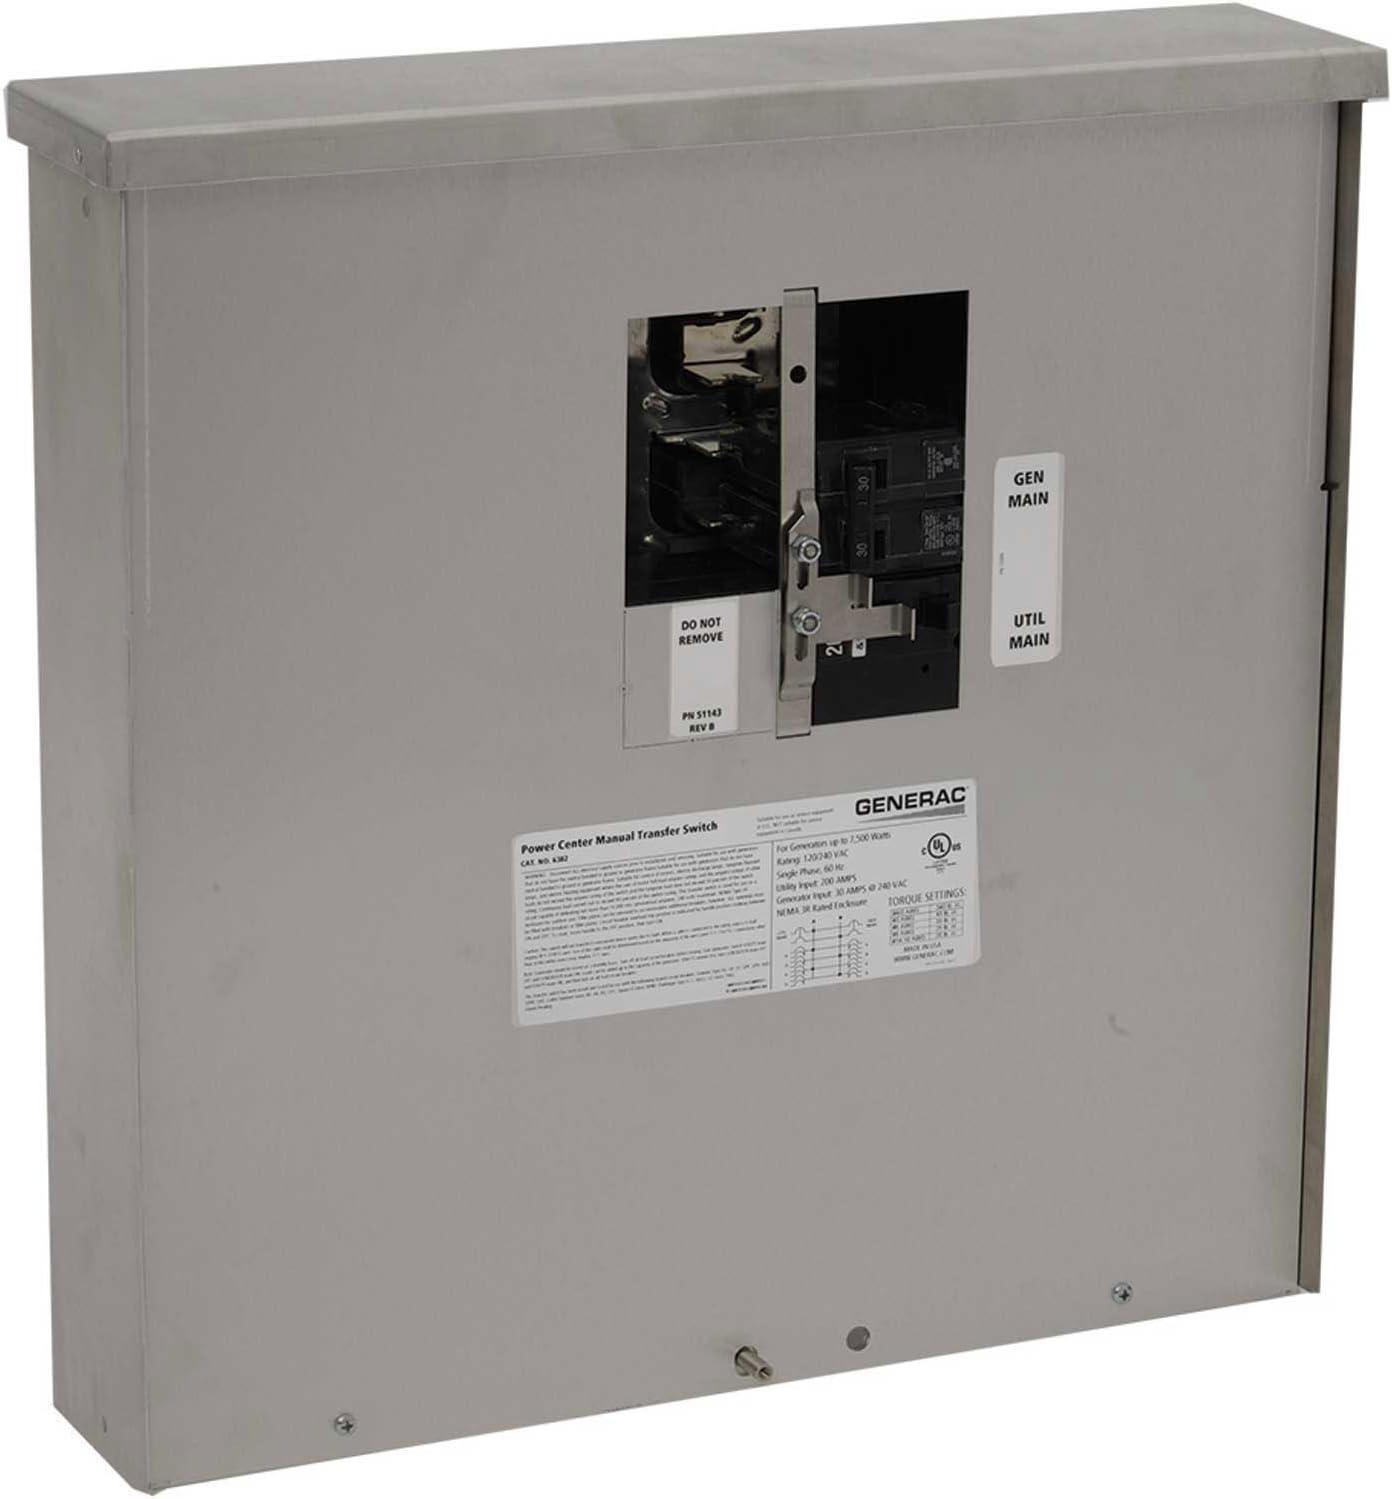 generac 30 amp generator plug wiring diagram amazon com generac 6382 30 amp manual transfer switch outdoor  generac 6382 30 amp manual transfer